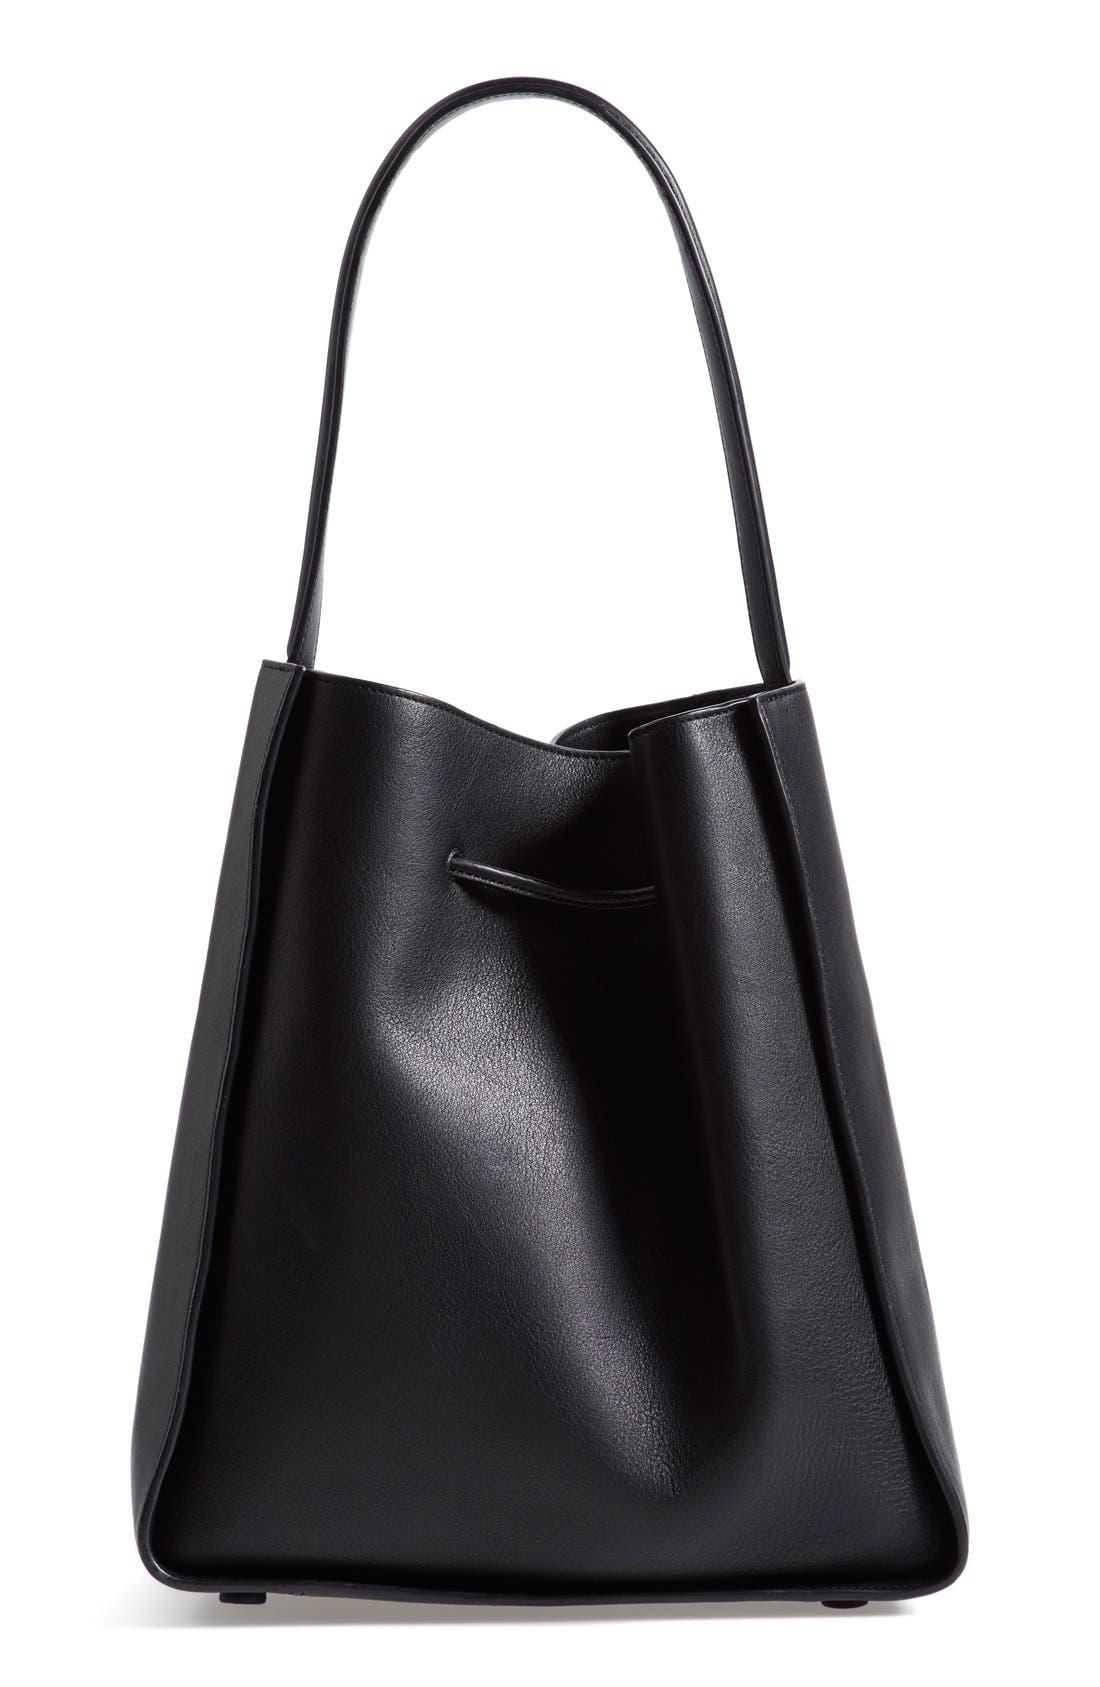 3.1 PHILLIP LIM, 'Large Soleil' Leather Bucket Bag, Alternate thumbnail 3, color, 001